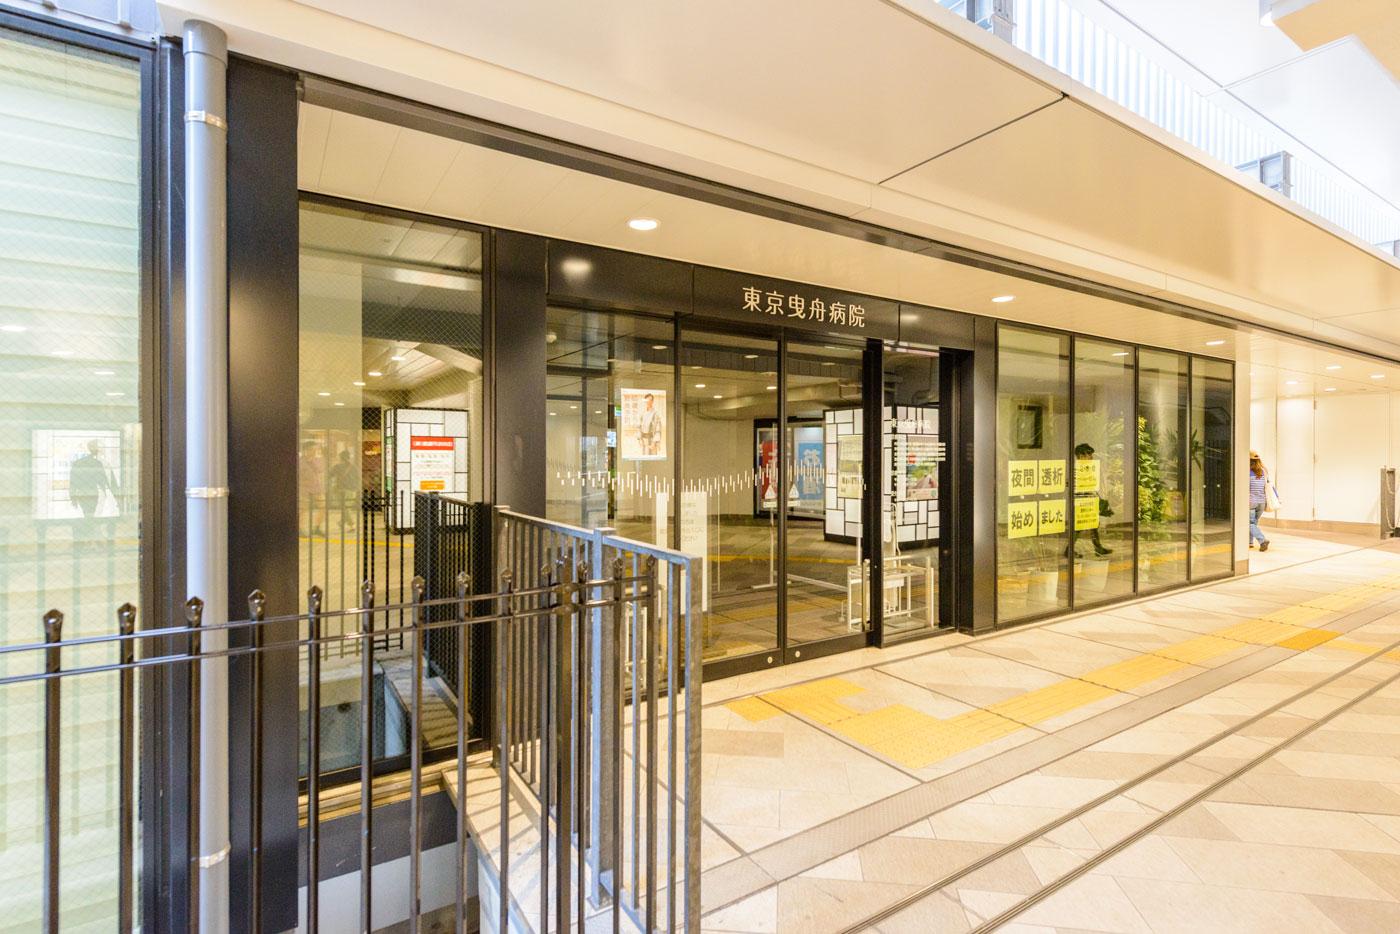 「曳舟」駅から直結「東京曳舟病院」